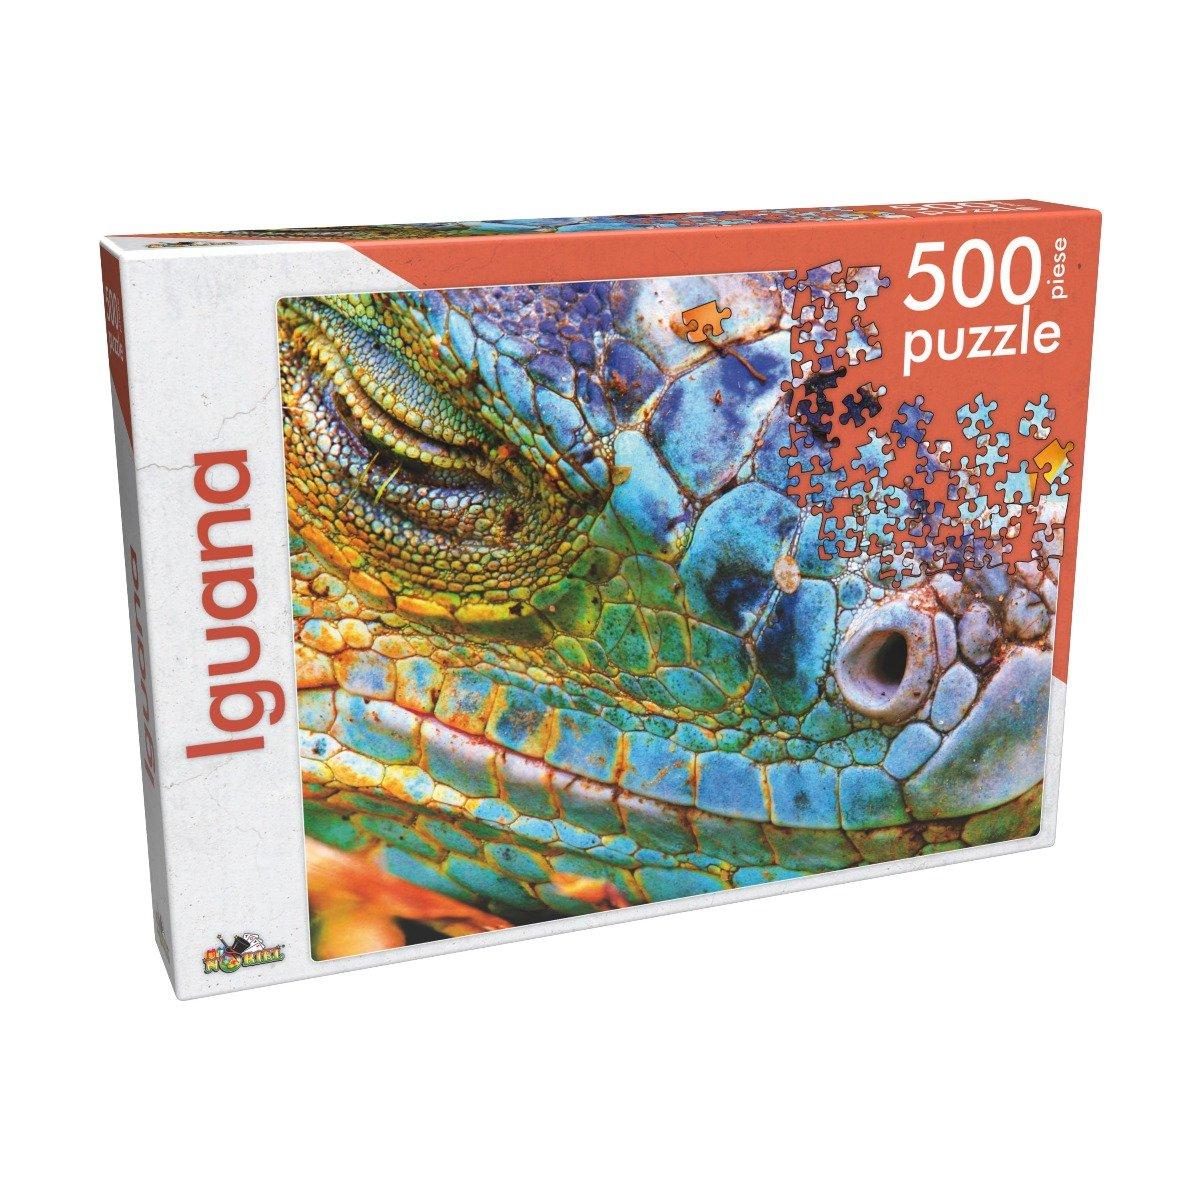 Puzzle clasic Noriel - Iguana, 500 piese